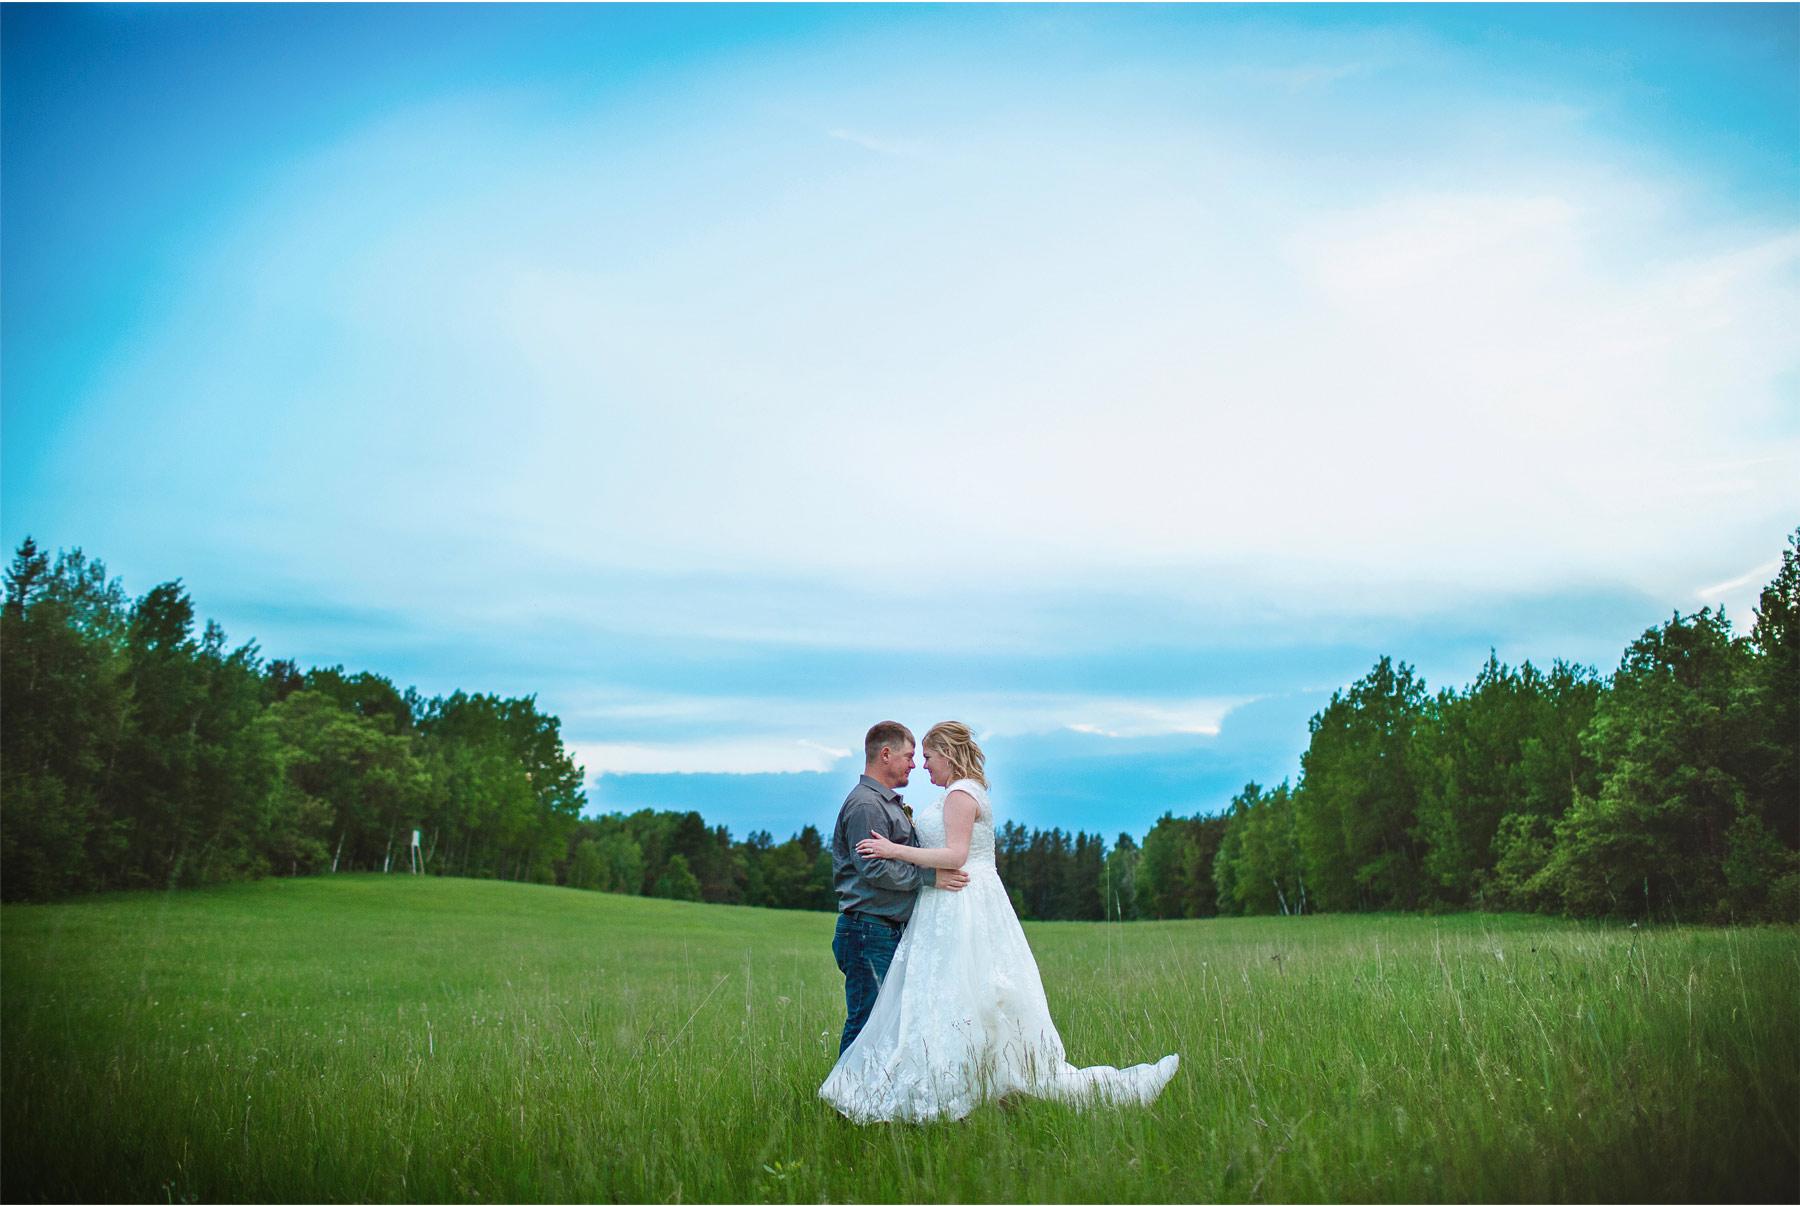 13-Vick-Photography-Wedding-Brainerd-Minnesota-Pine-Peaks-Lodge-Cabin-Rustic-Night-Bride-Groom-Kristi-and-Noel.jpg